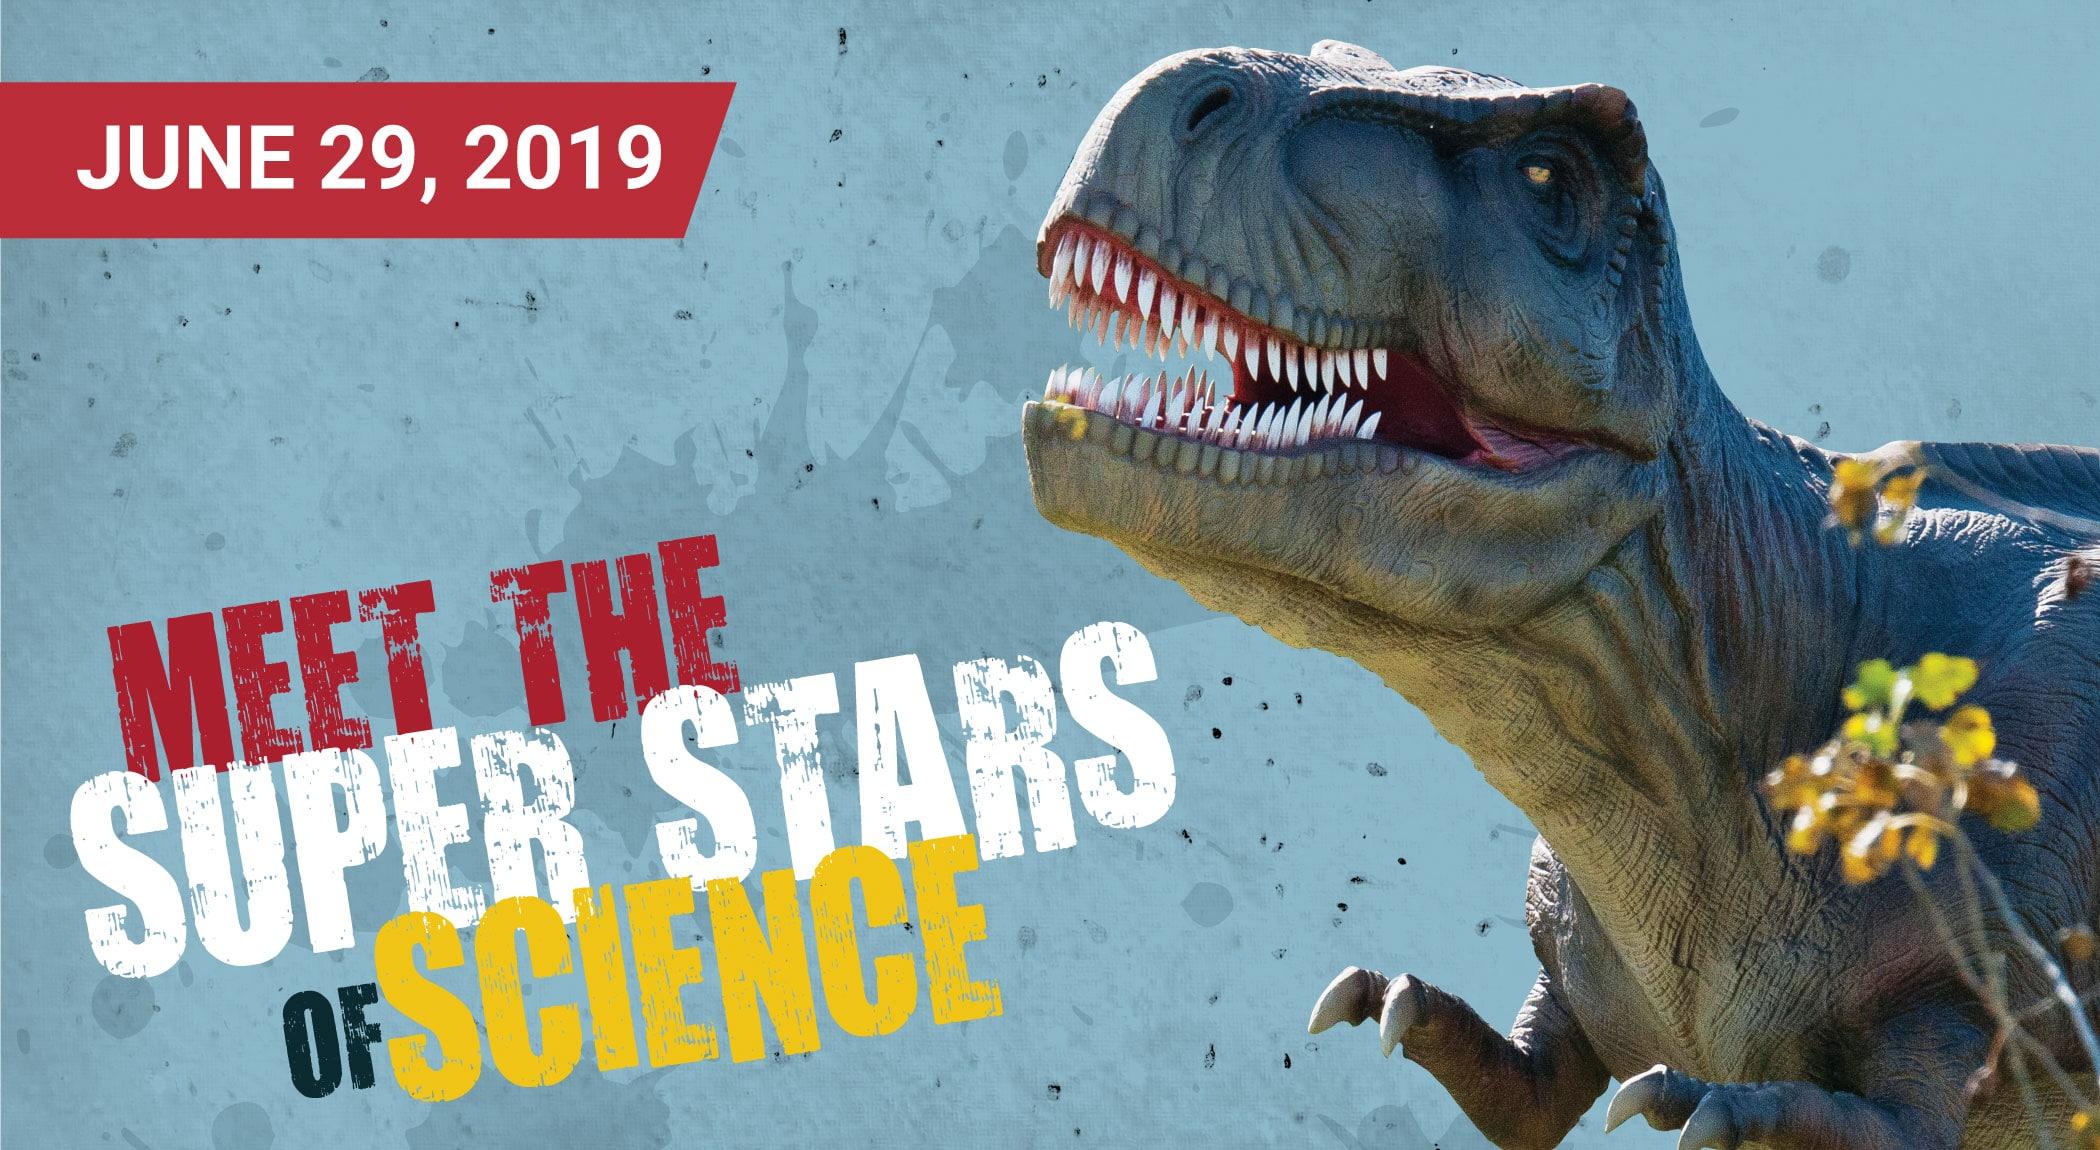 Super Stars of Science - June 29